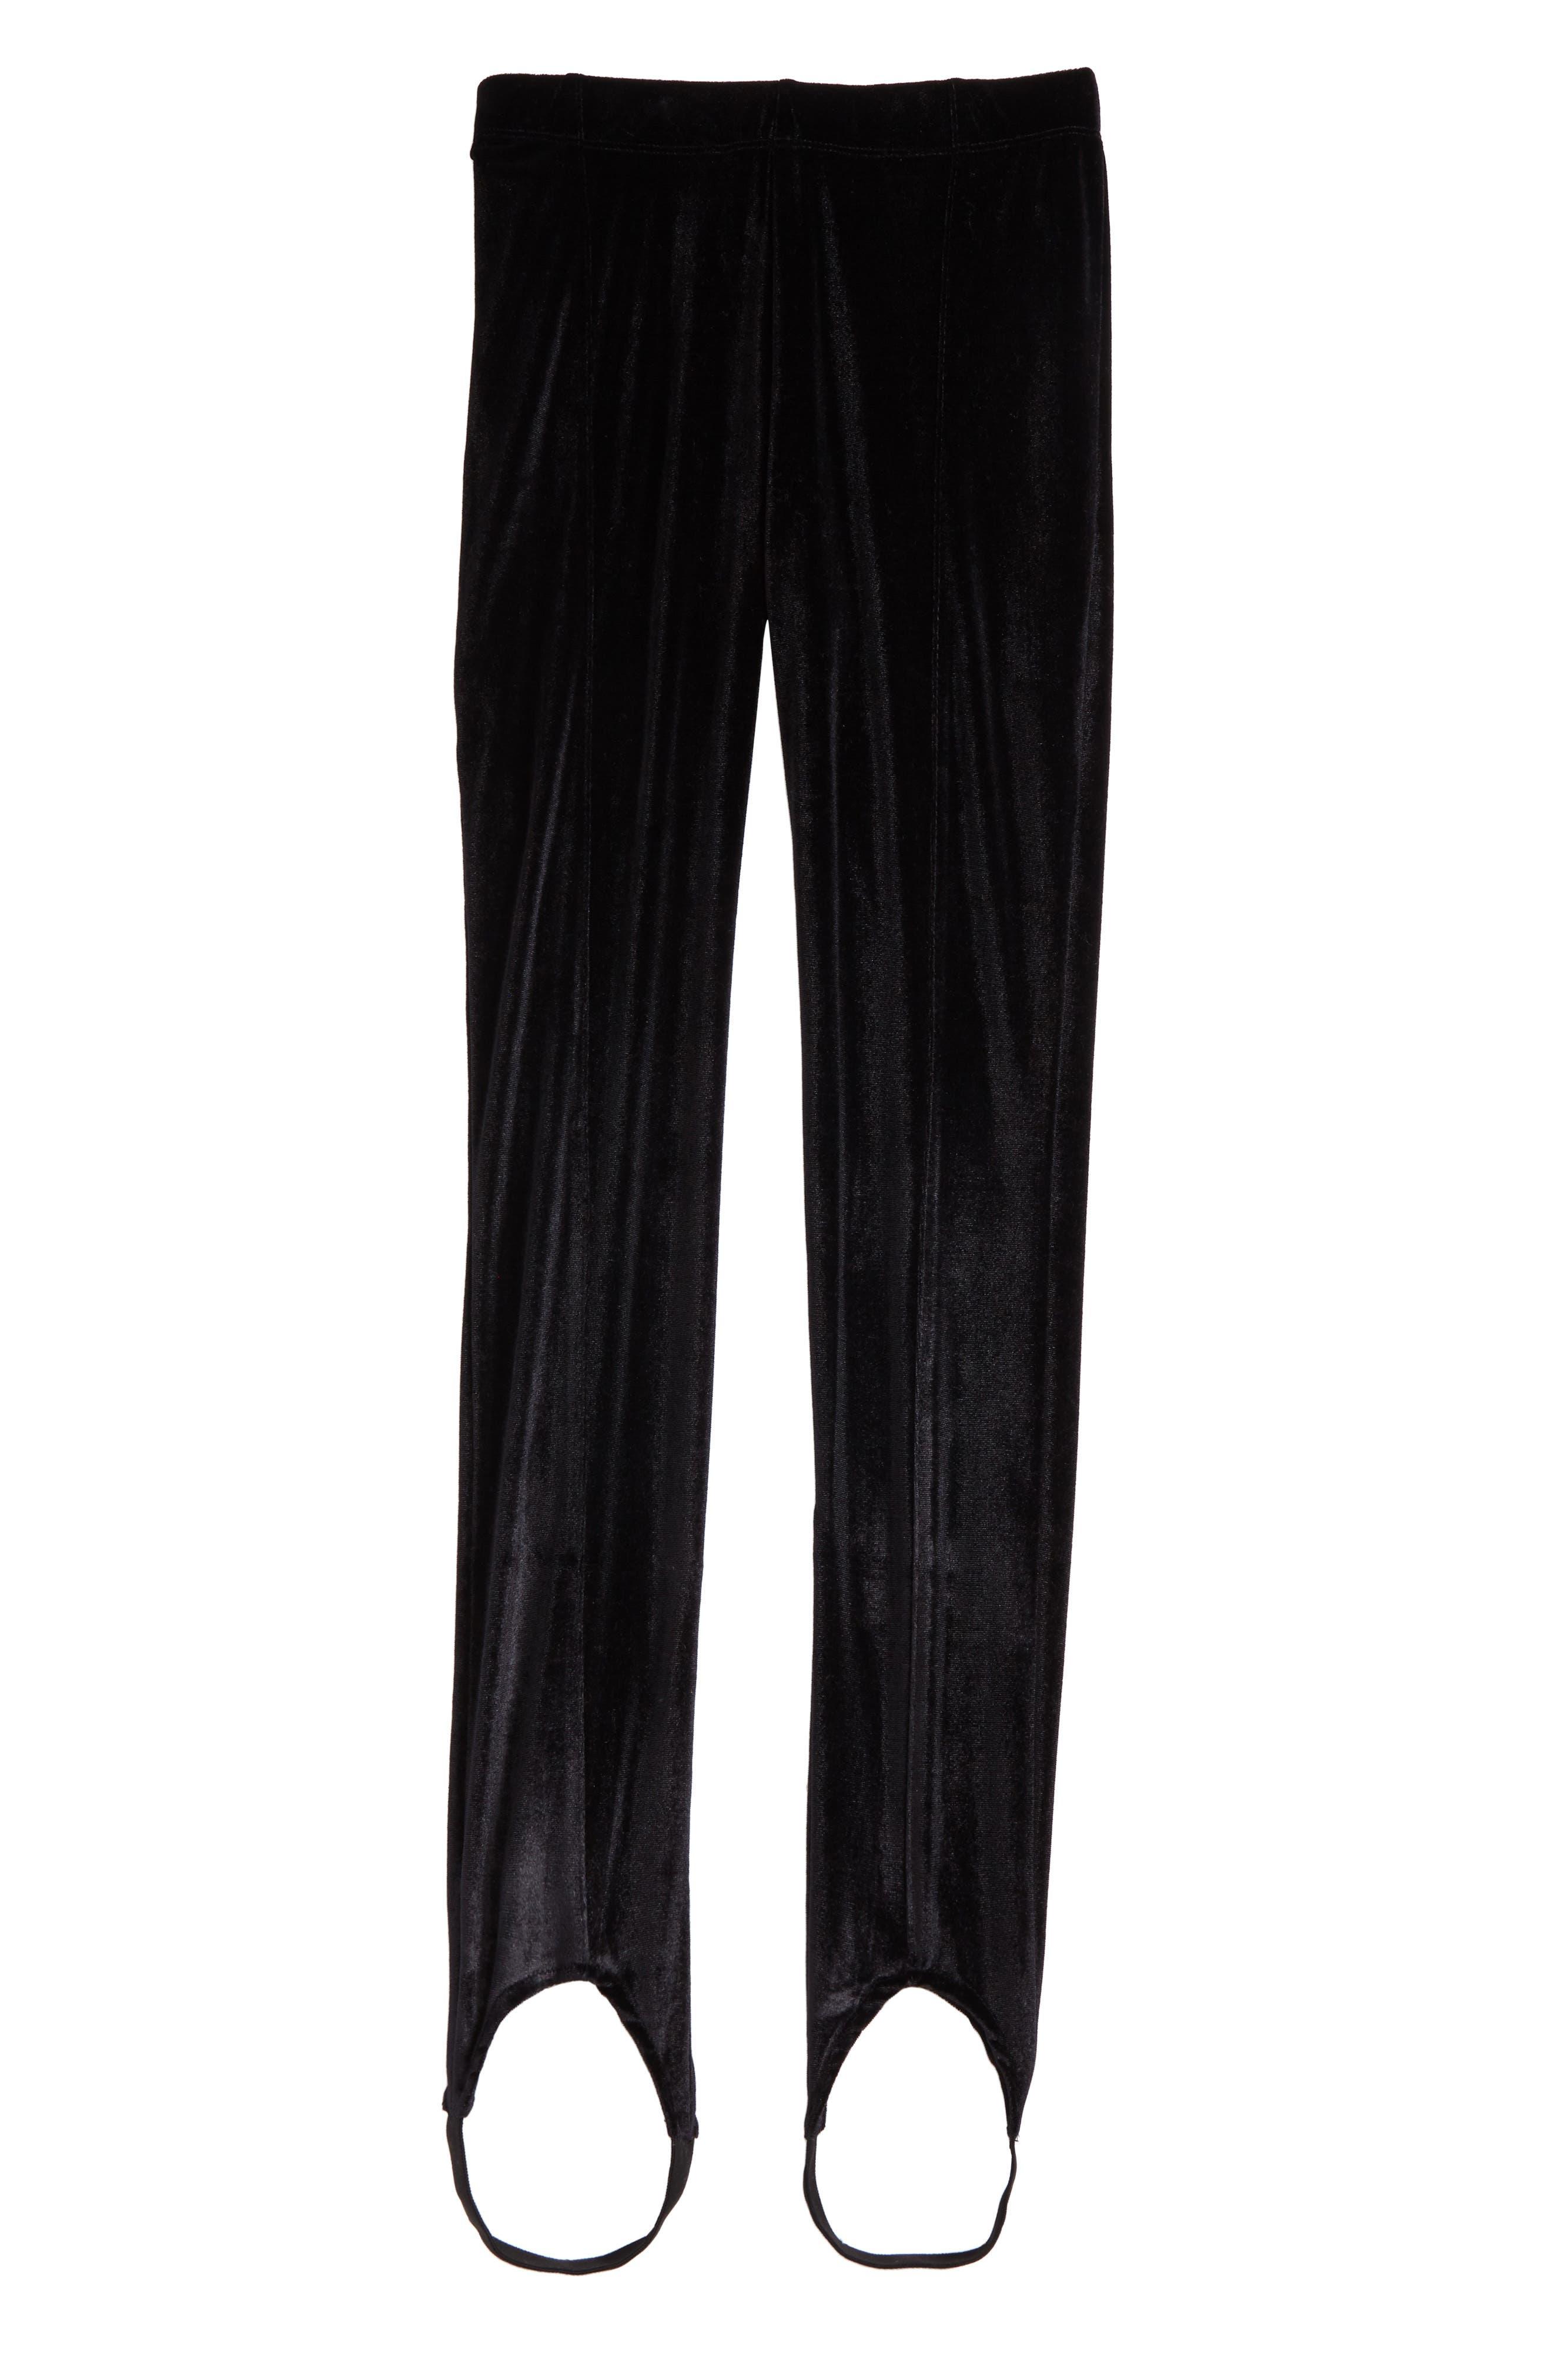 Velvet Stirrup Pants,                             Main thumbnail 1, color,                             Black